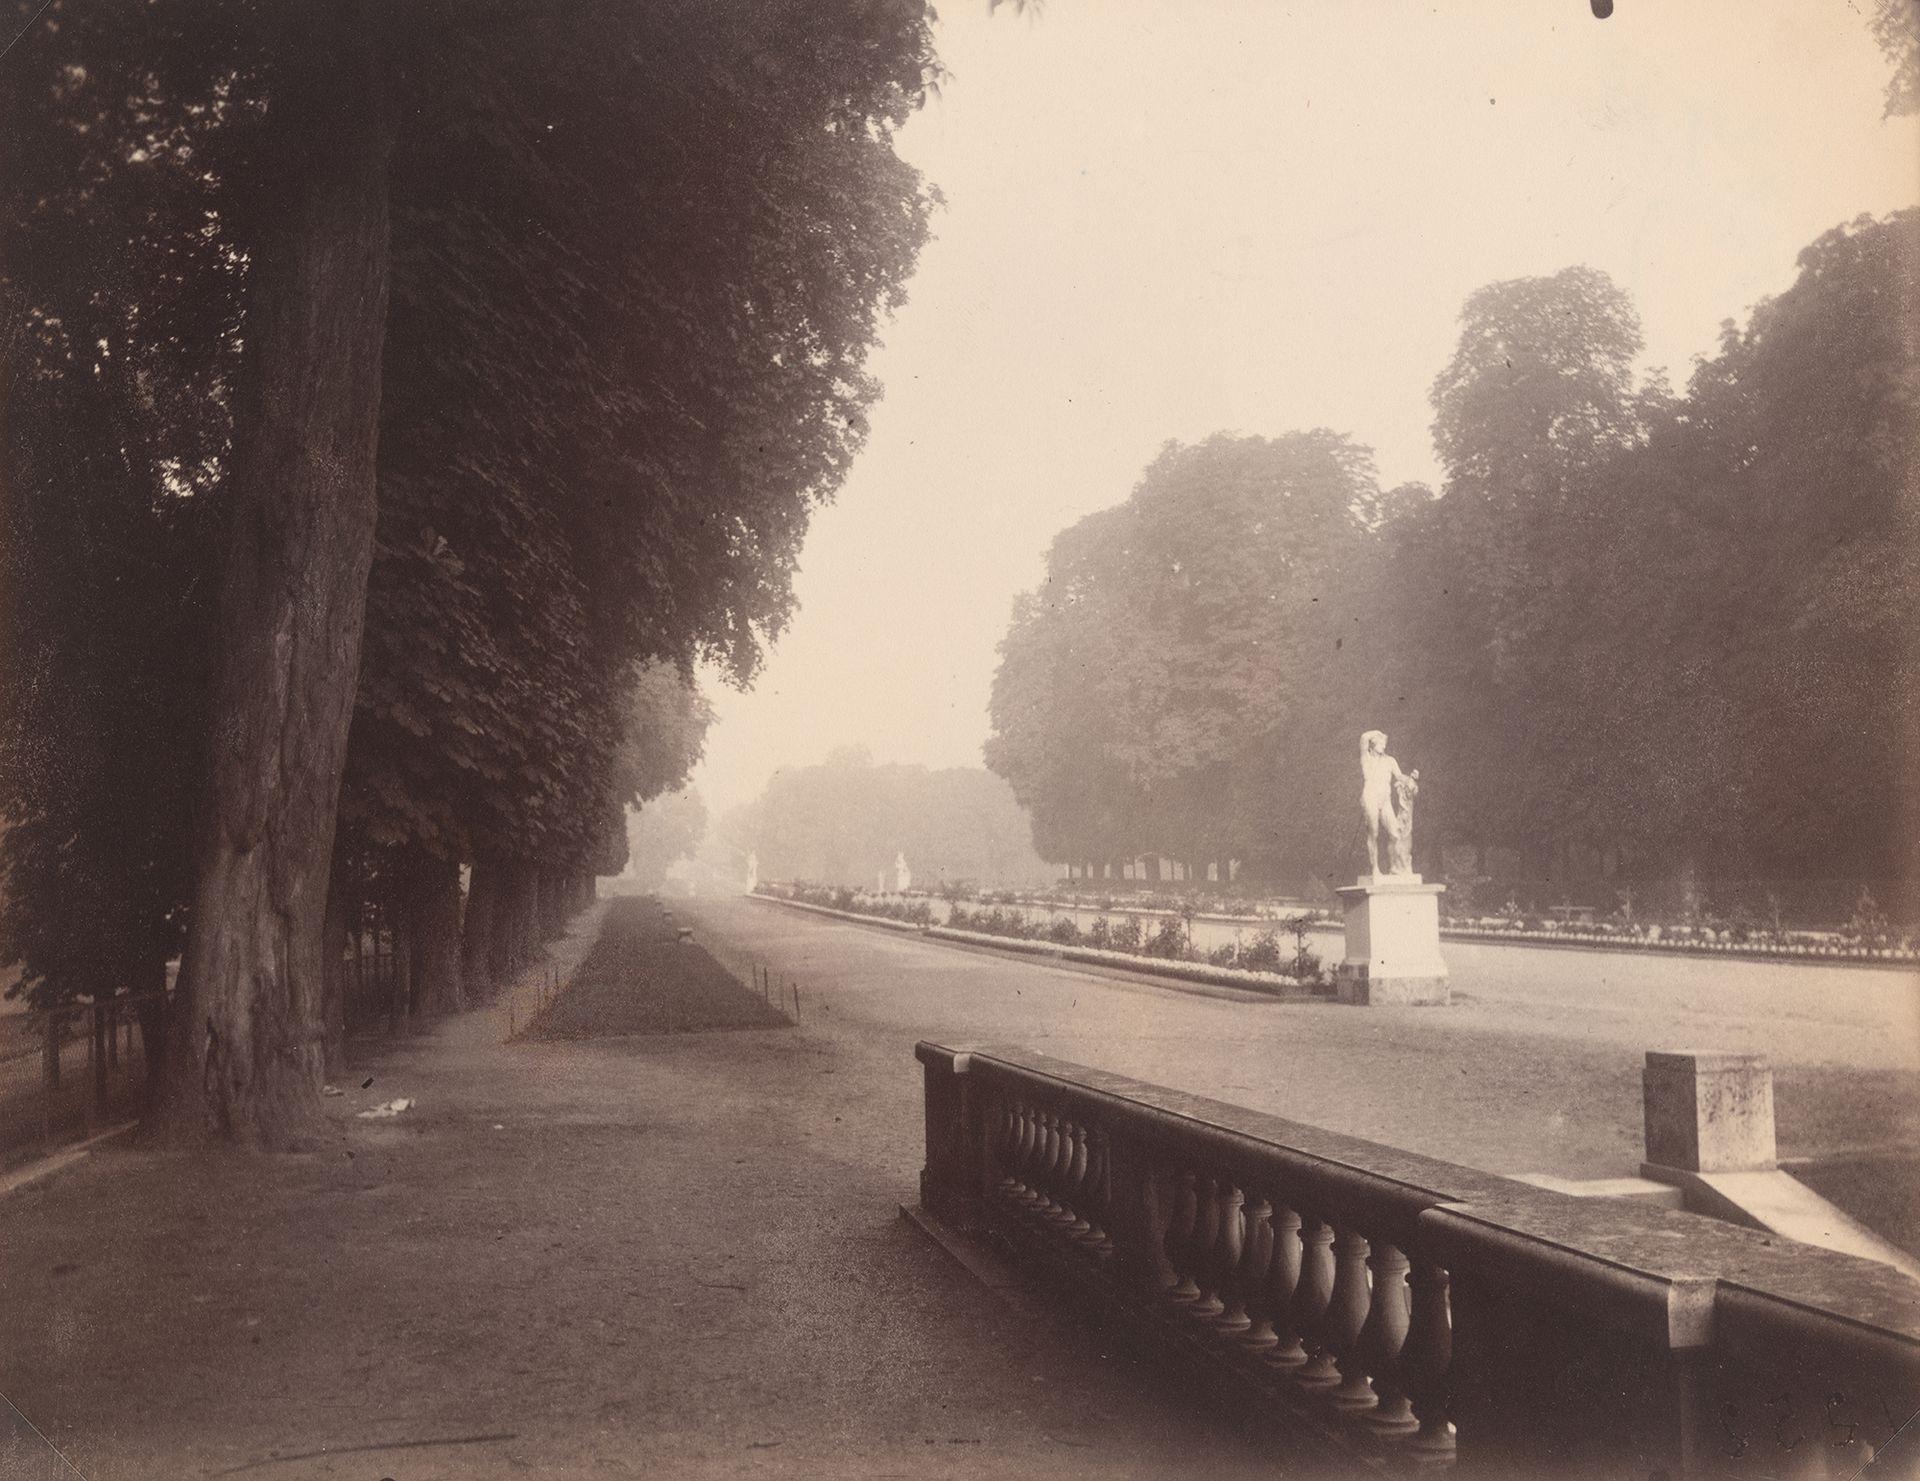 Eugène Atget Saint-Cloud. End of August, 6:30 a.m., 1924 National Gallery of Art, Washington